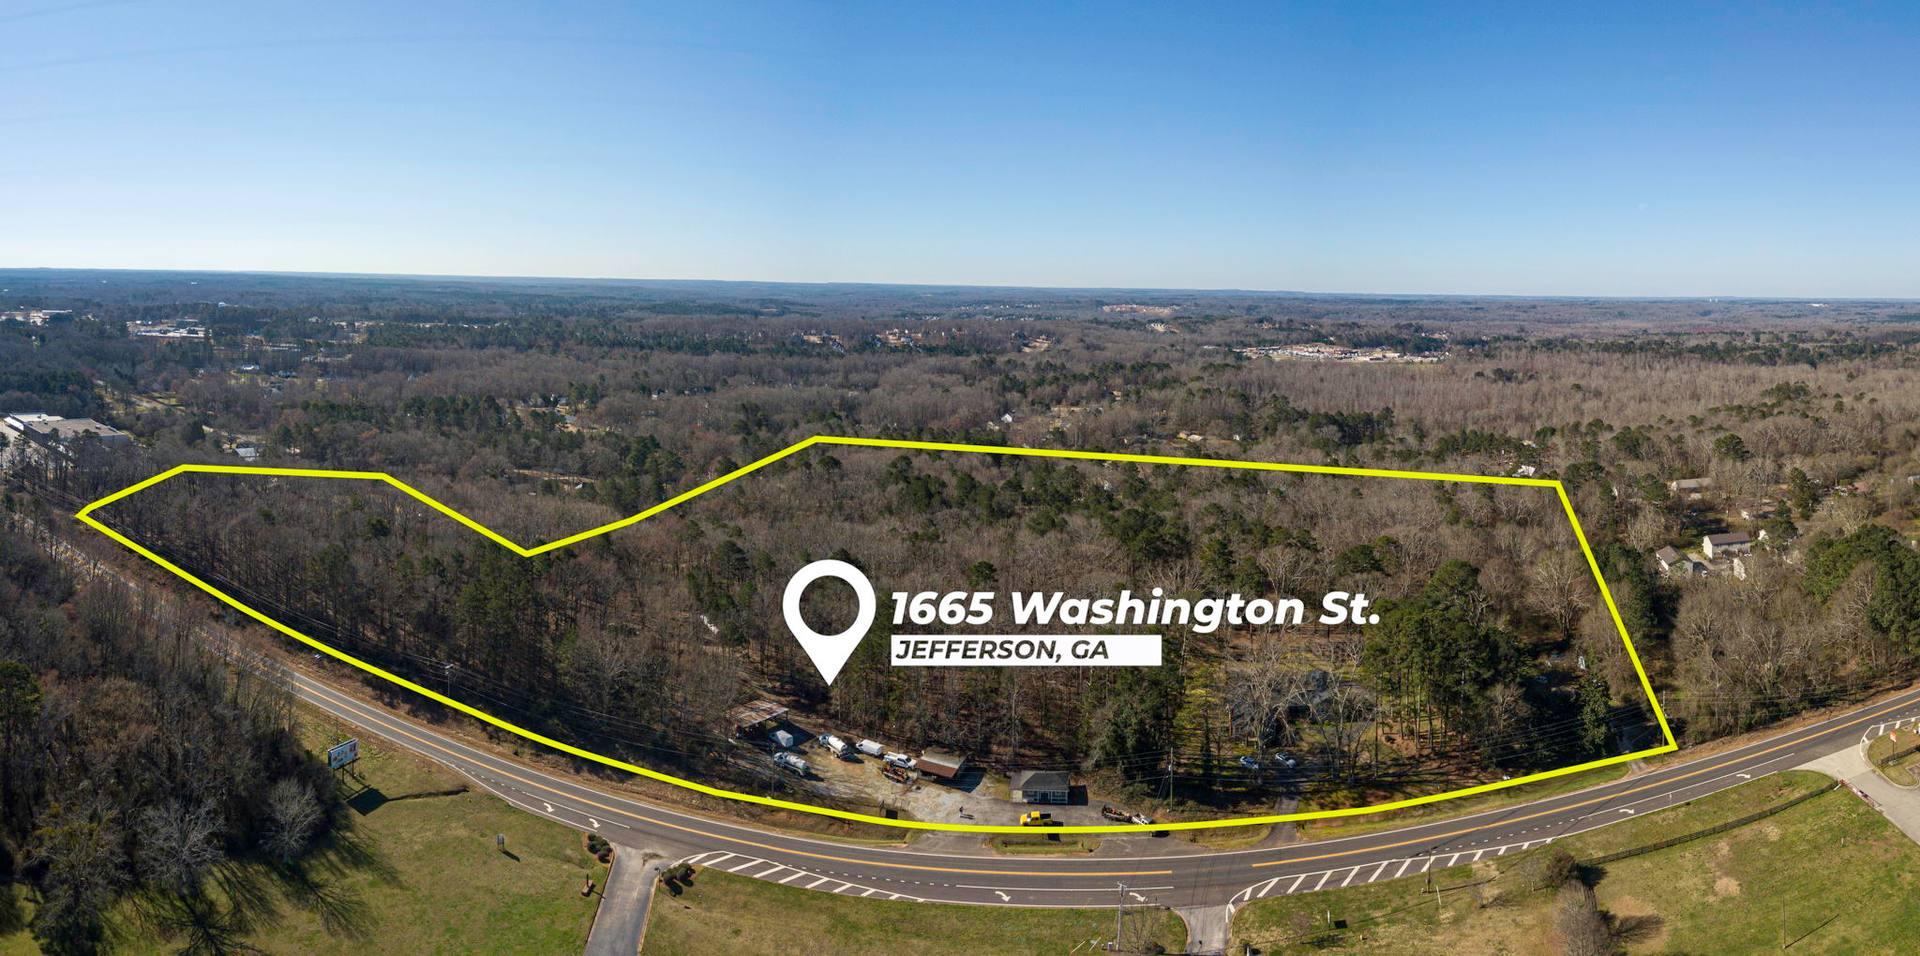 1665 Washington St, Jefferson, GA 30549, US